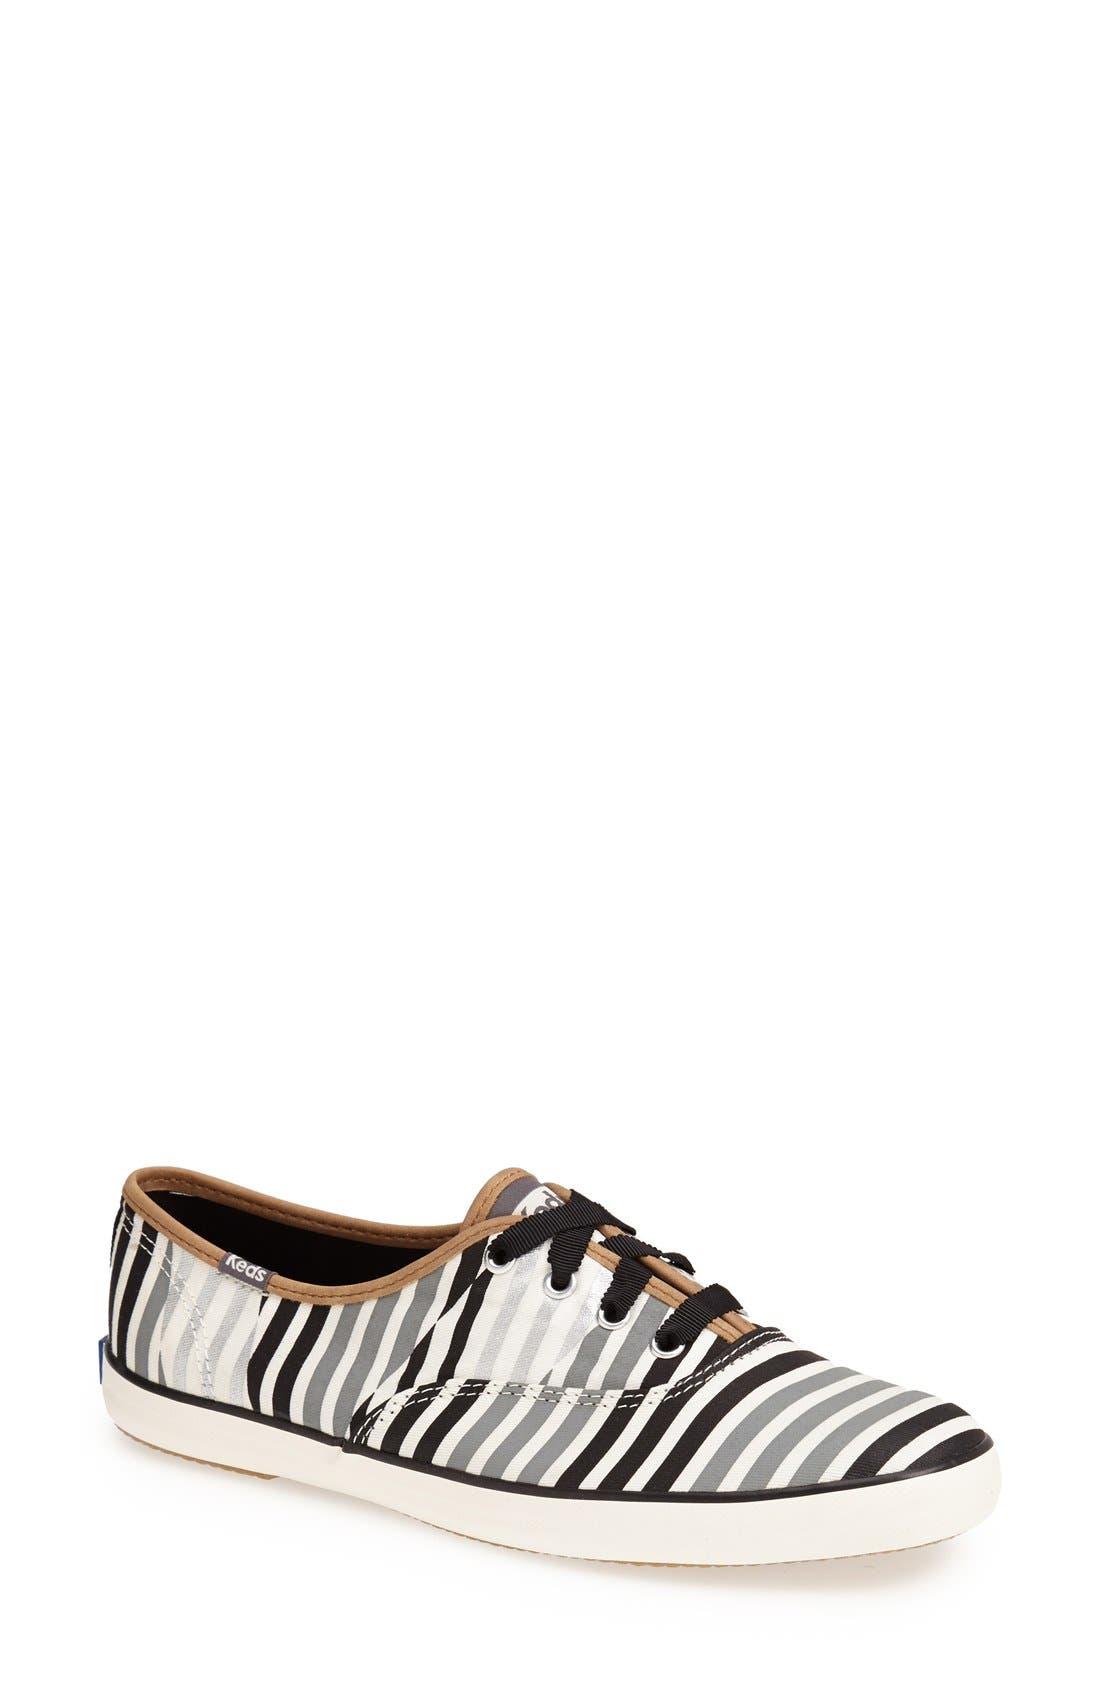 Alternate Image 1 Selected - Keds® 'Champion Stripe' Sneaker (Women)